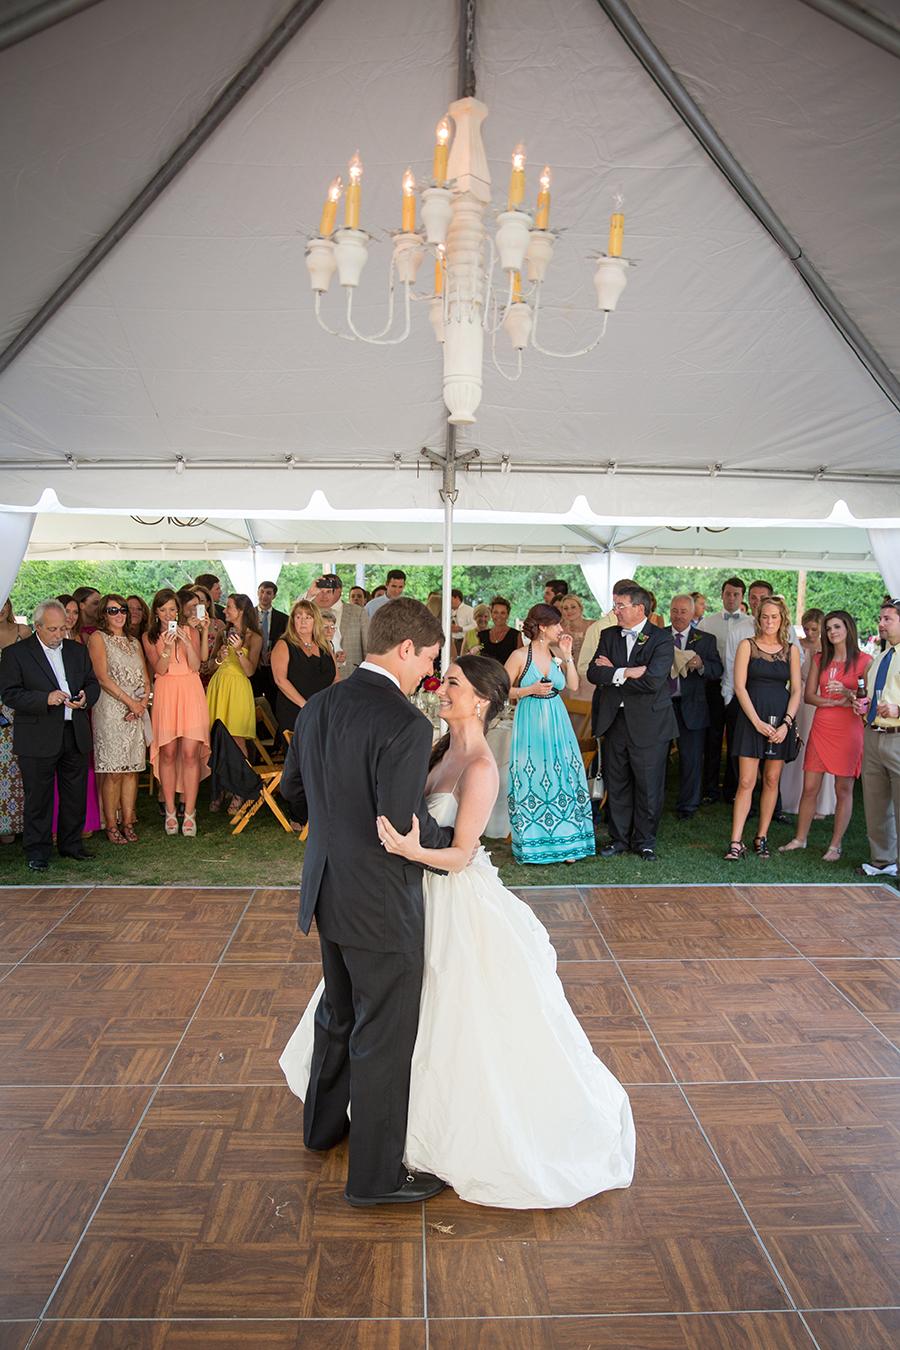 wedding_rentals2.jpg